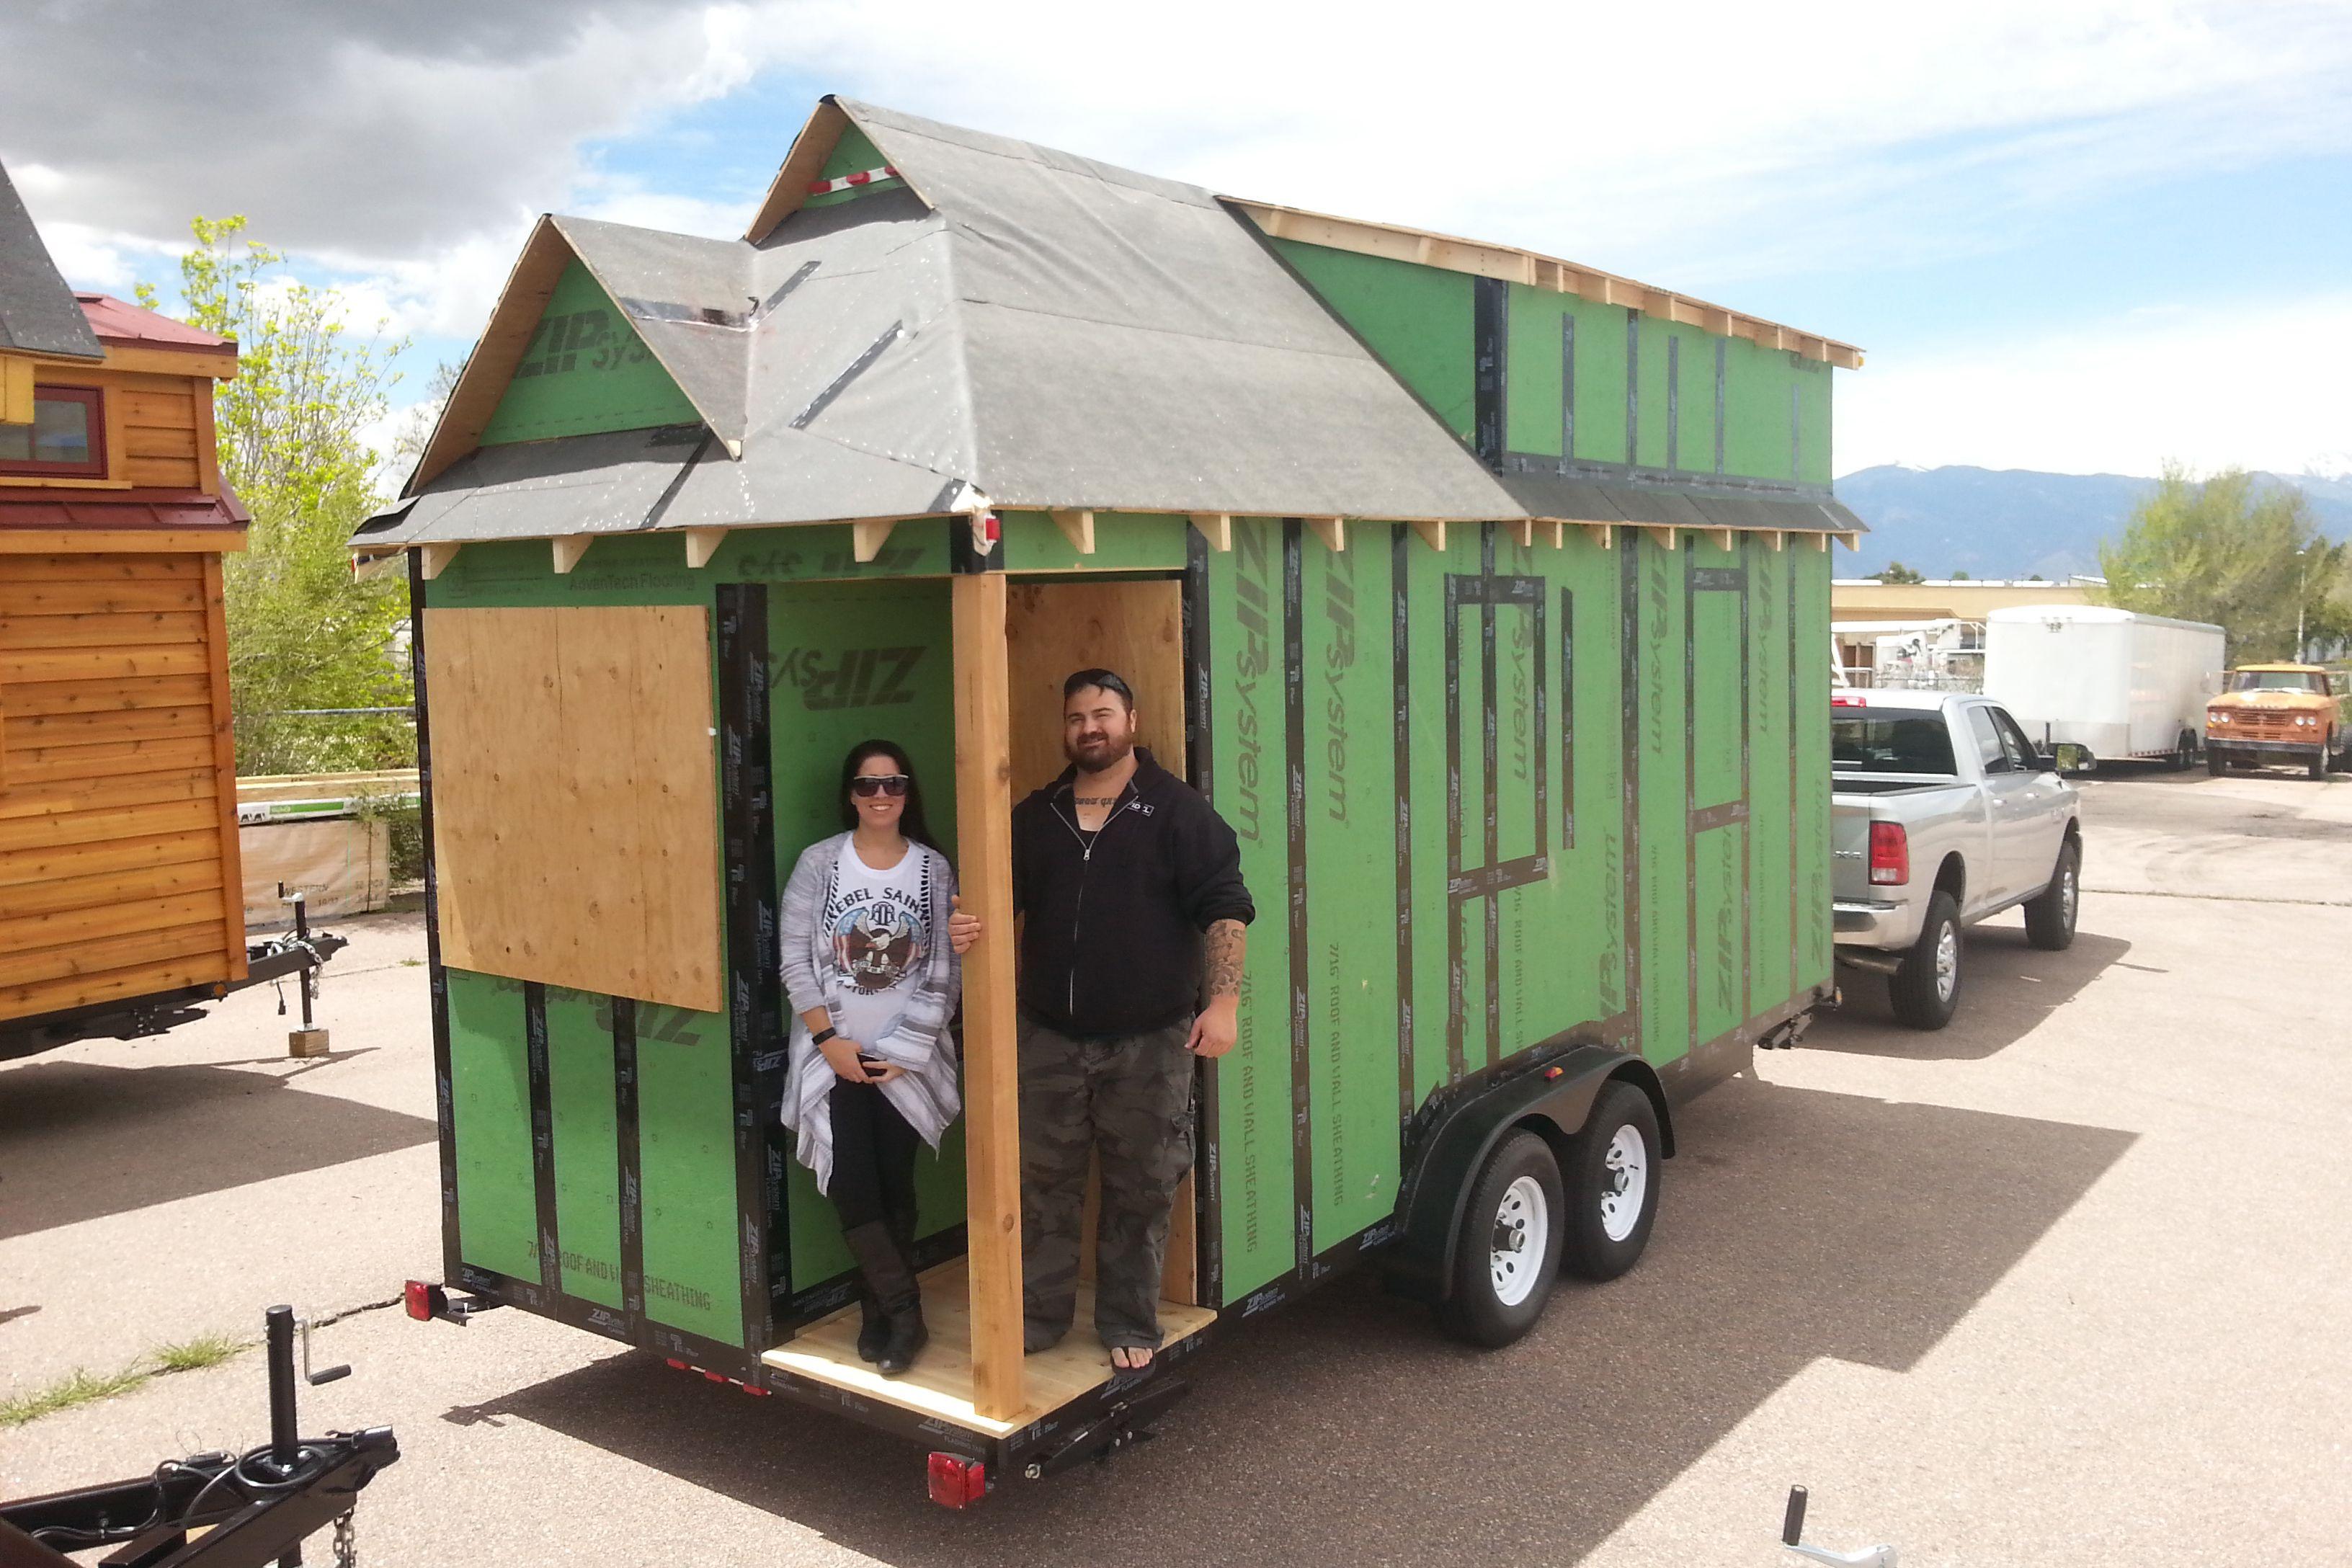 7 Totally Doable DIY Tiny House Kits on mexican mobile home, kentuckian mobile home, graham mobile home,